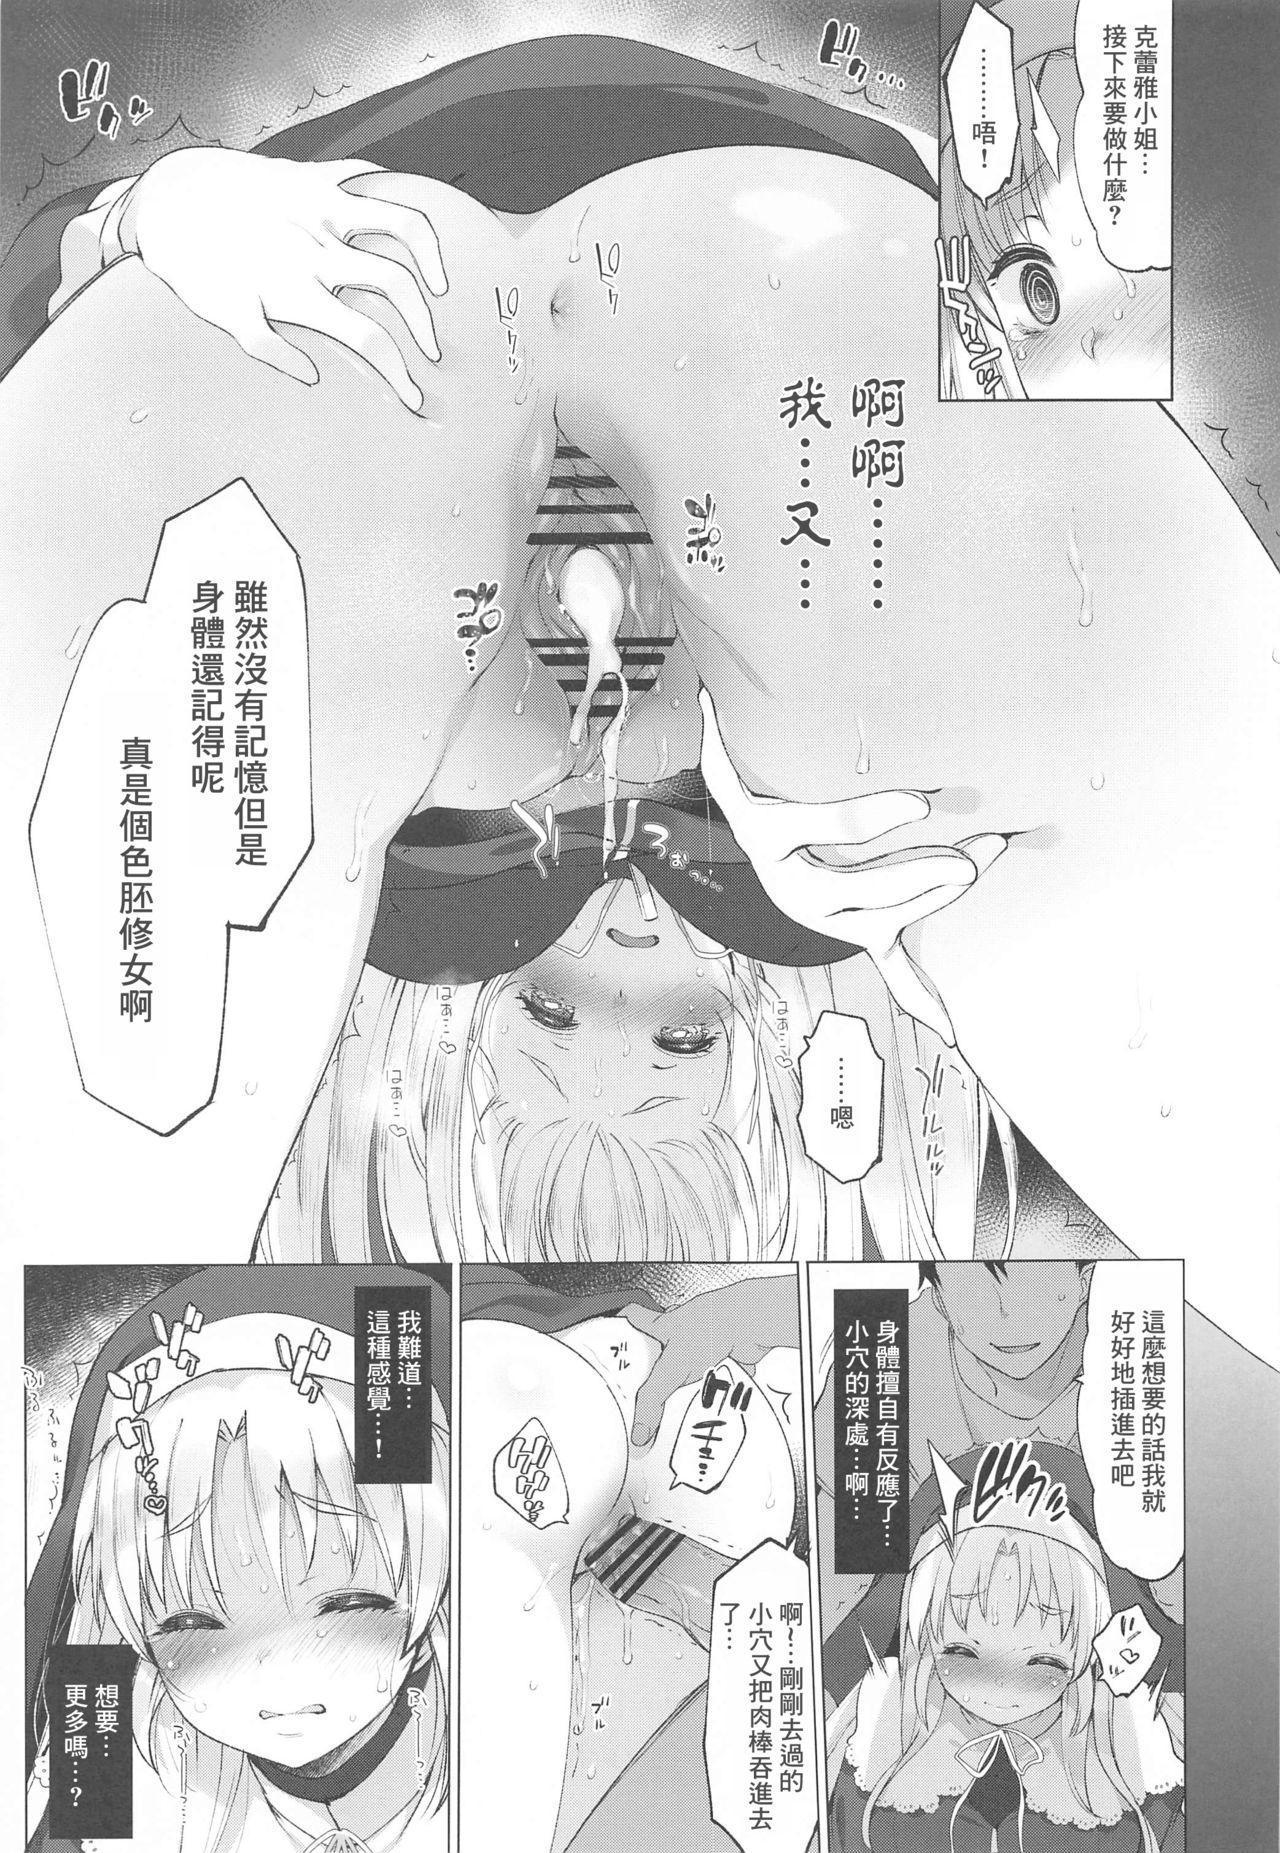 Sister Cleaire to Himitsu no Saimin Appli 2 19